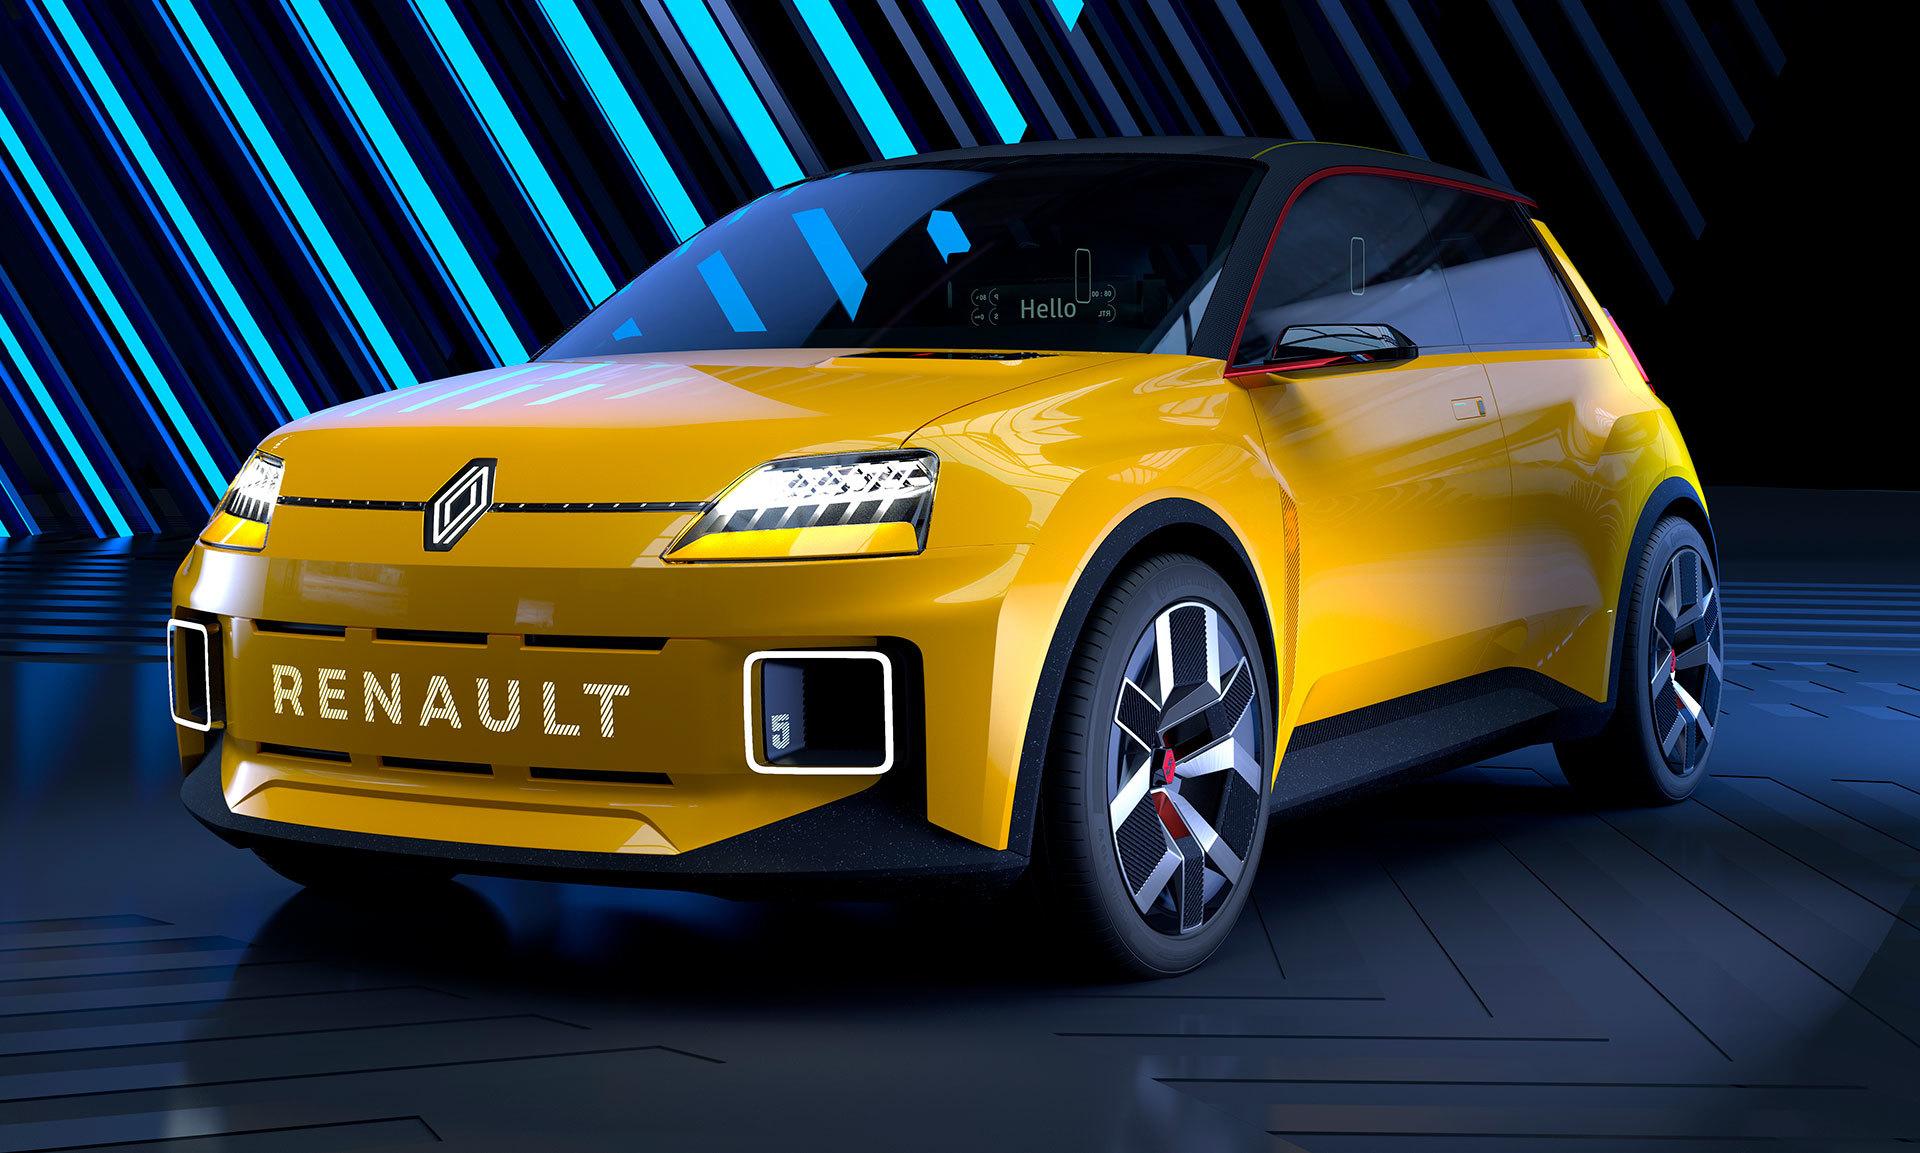 Nuevo Renault 5 Revolucion 2025 04